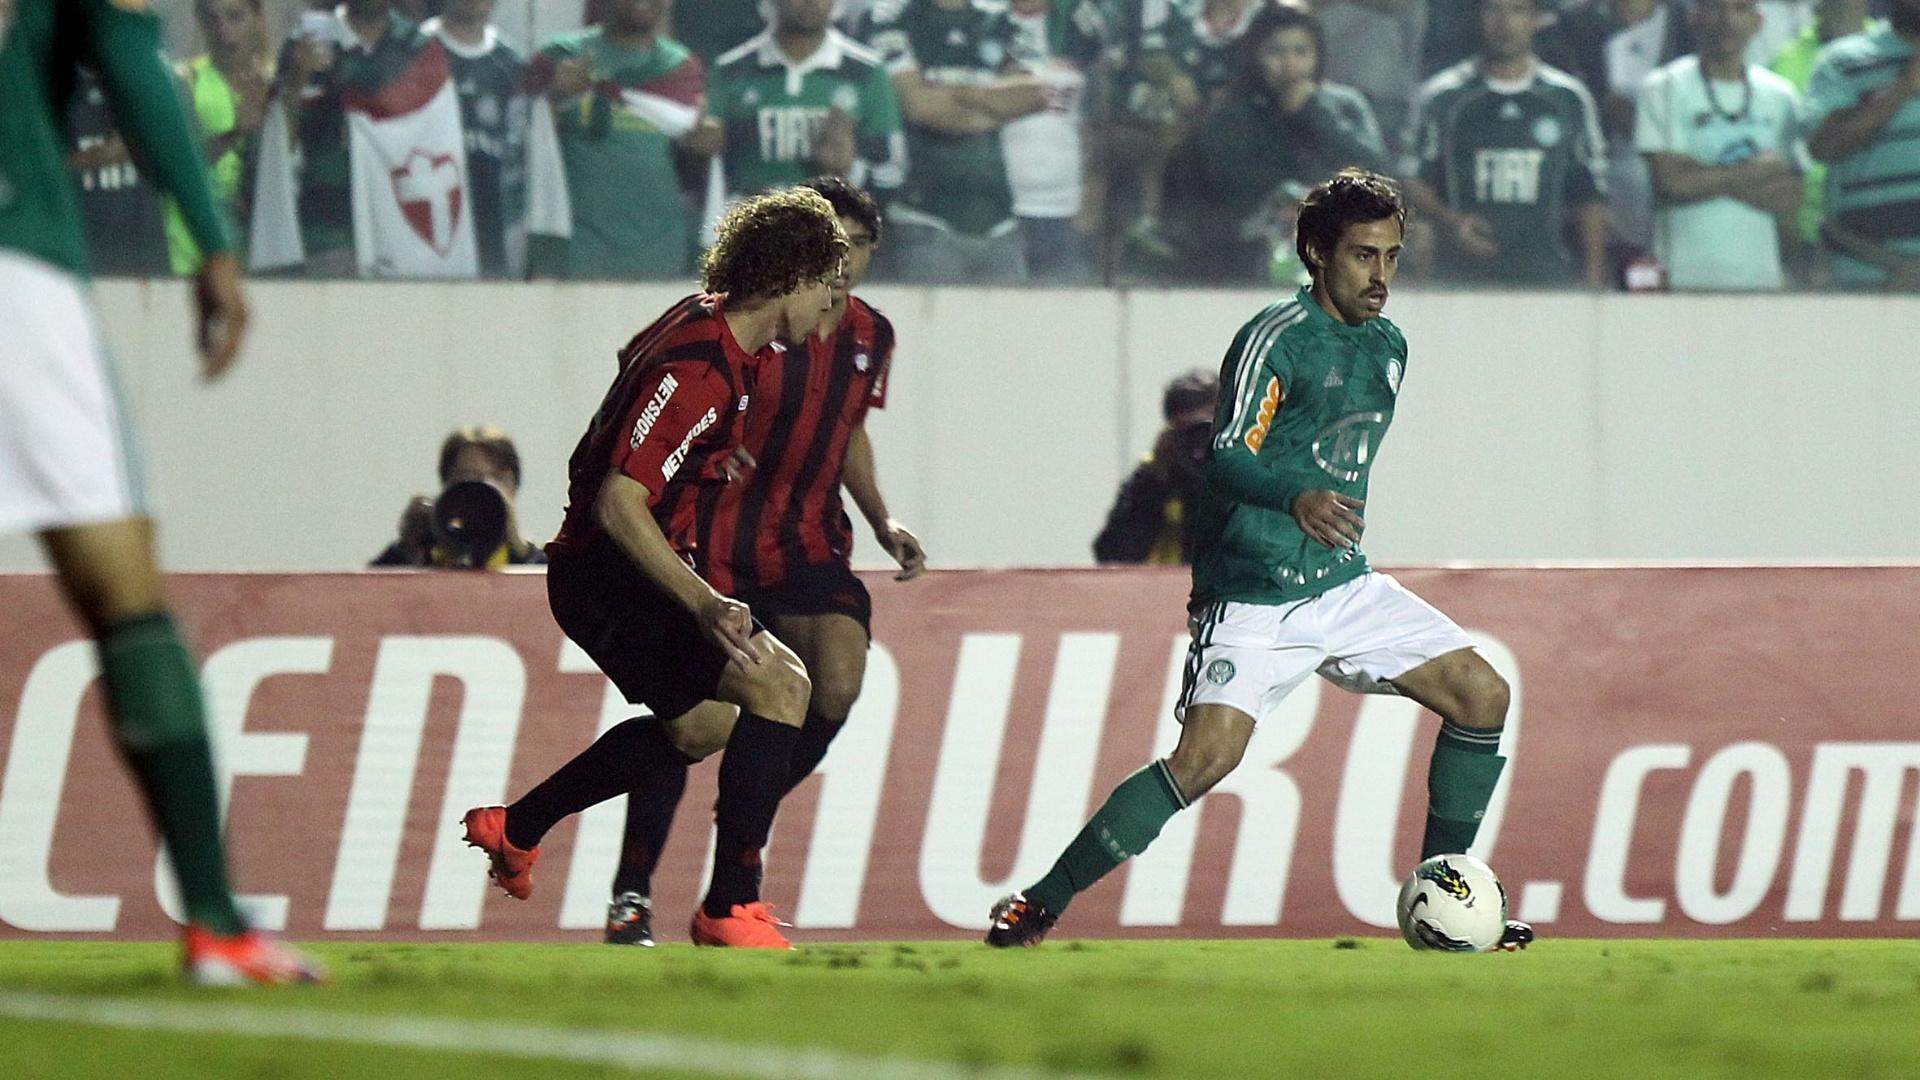 Valdivia conduz a bola e tenta levar o Palmeiras ao ataque durante o jogo contra o Atlético-PR